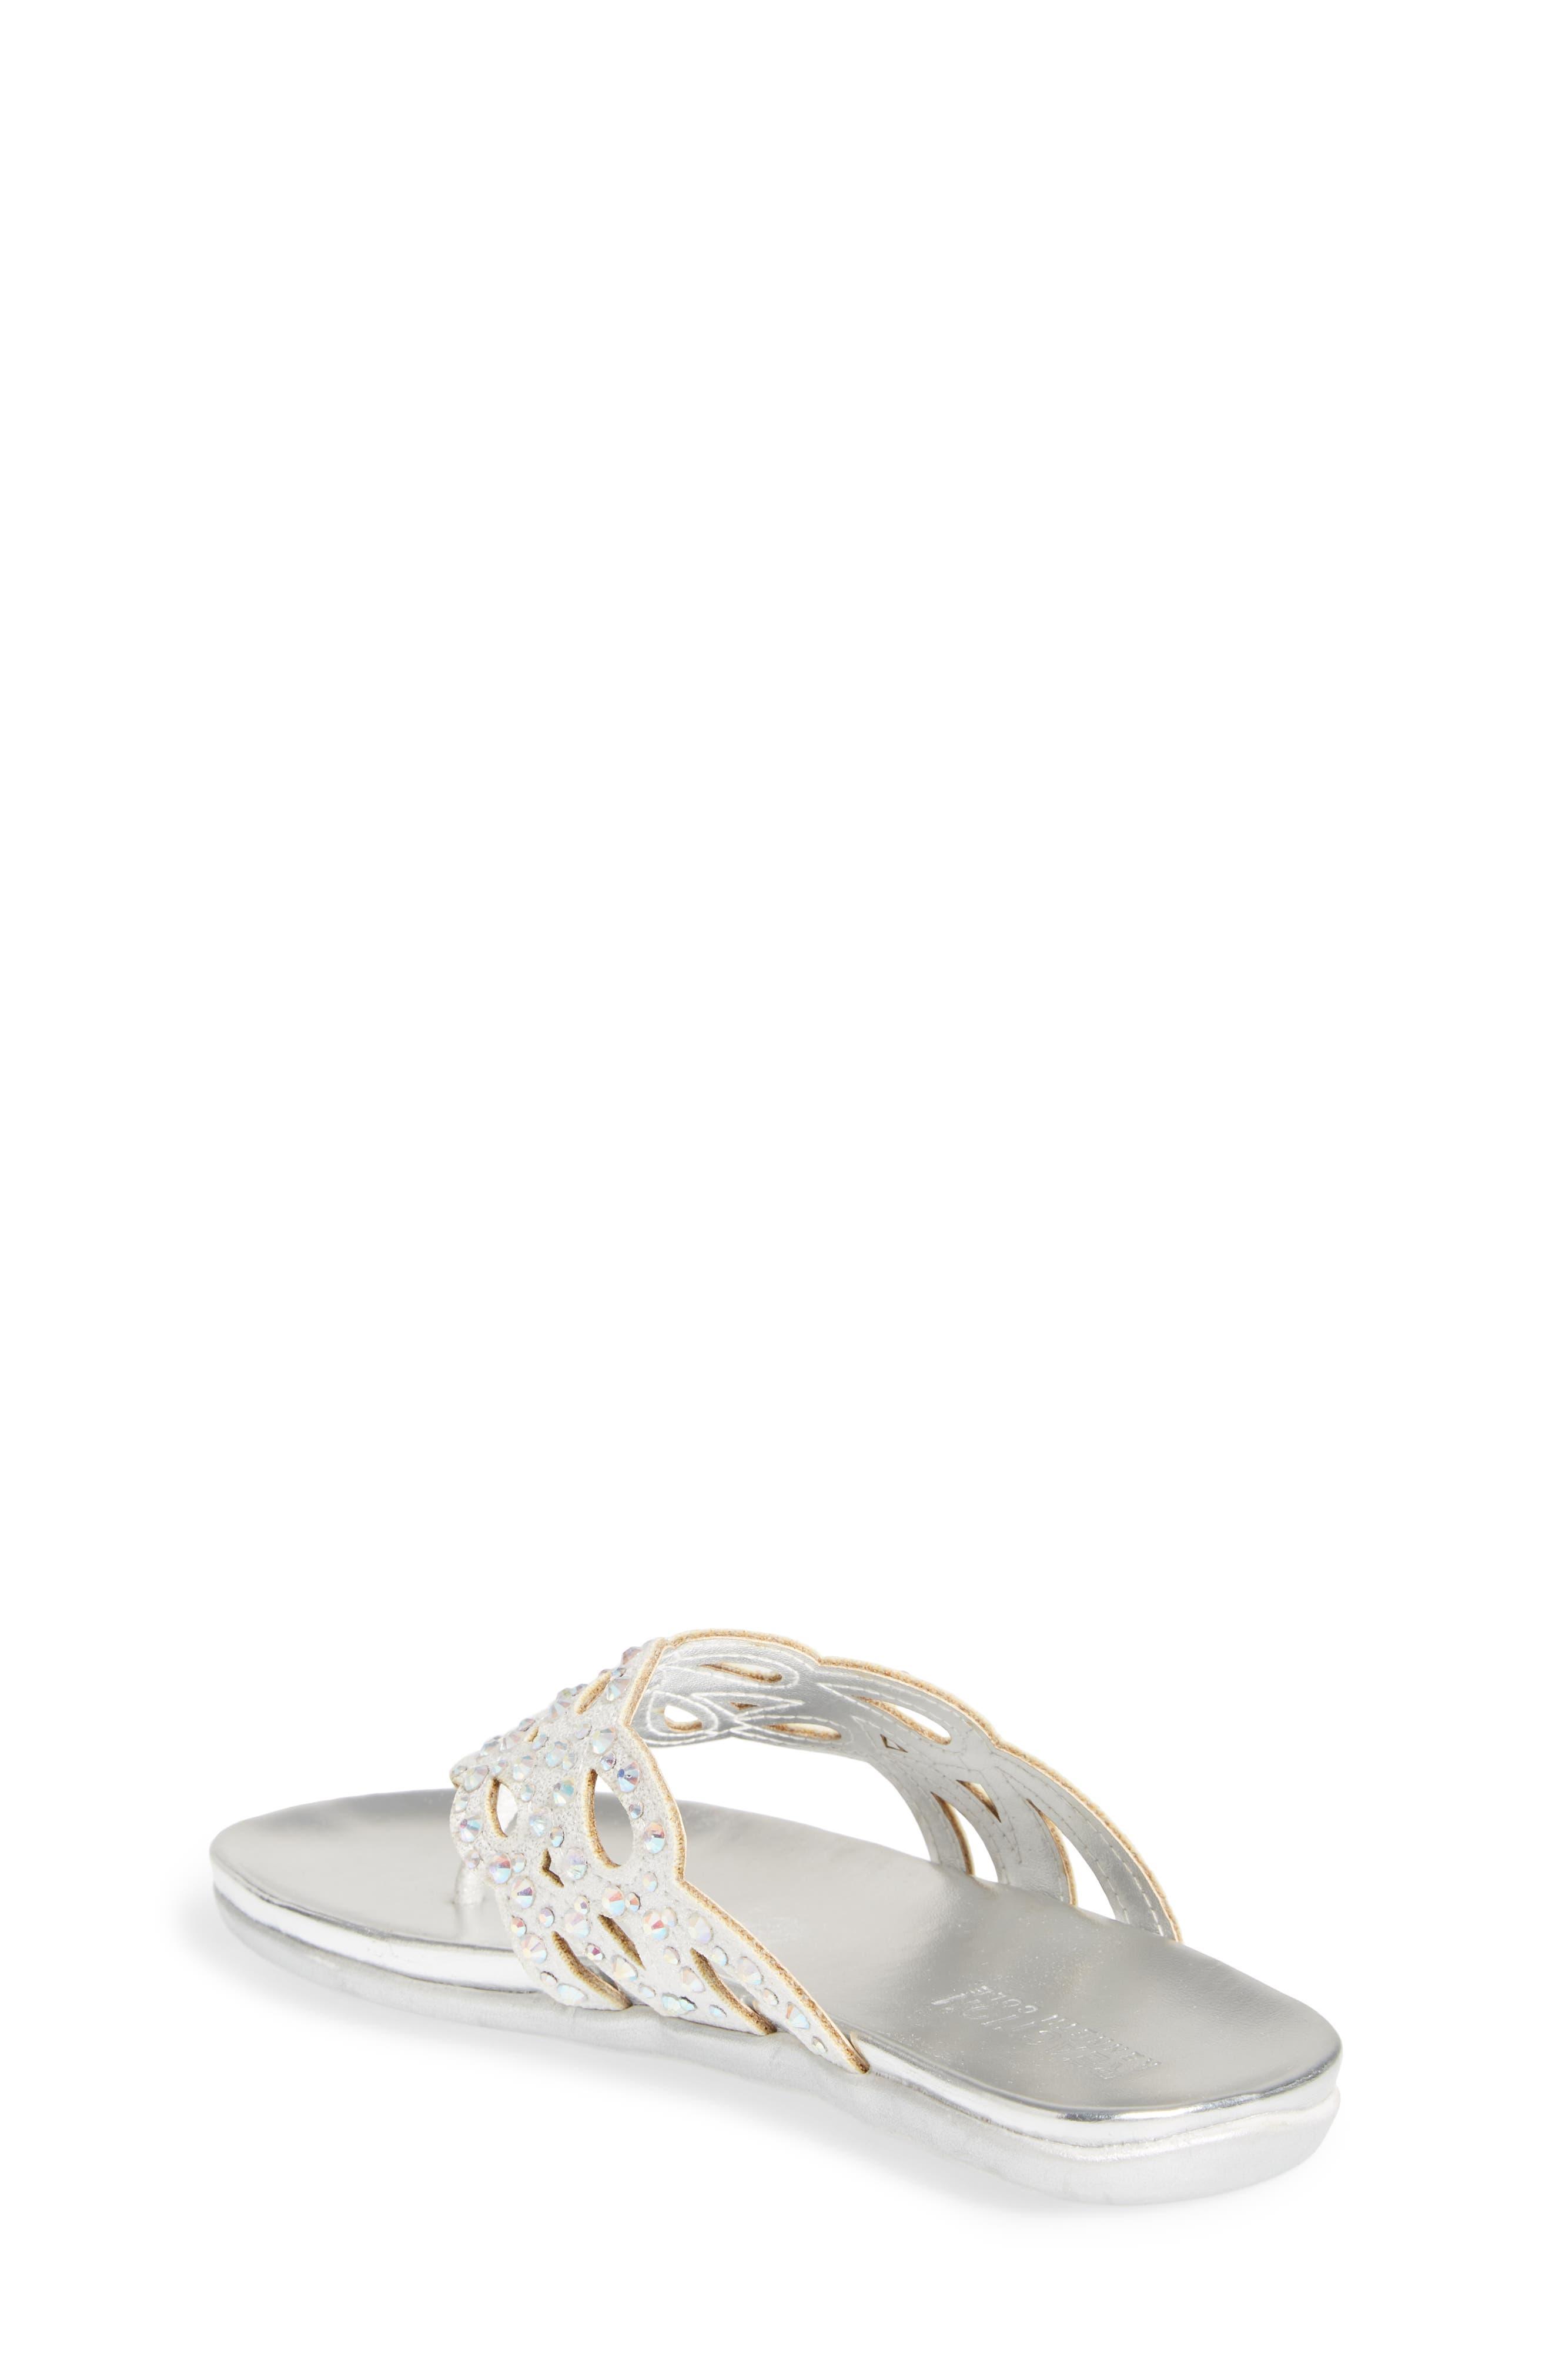 Kenneth Cole New York Flutter Metallic Crystal Thong Sandal,                             Alternate thumbnail 2, color,                             044